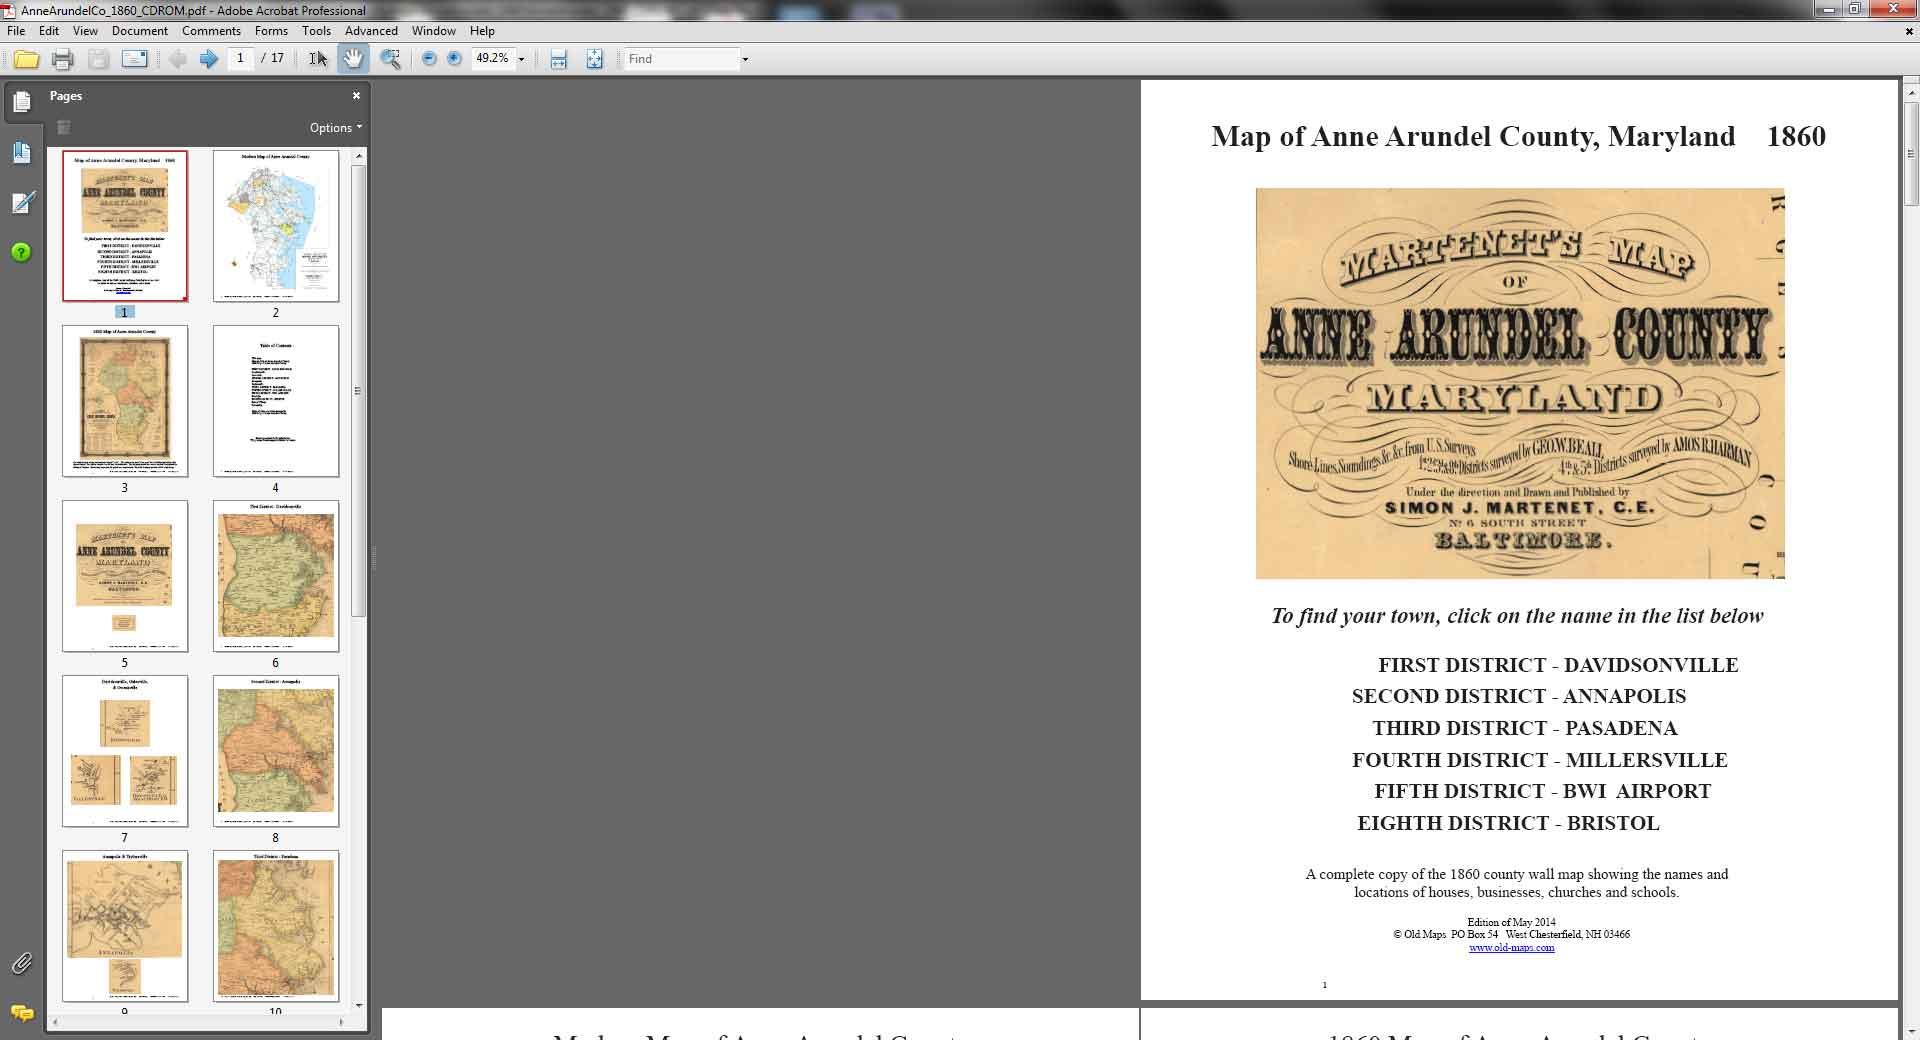 Anne Arundel County Maryland 1860 CDROM